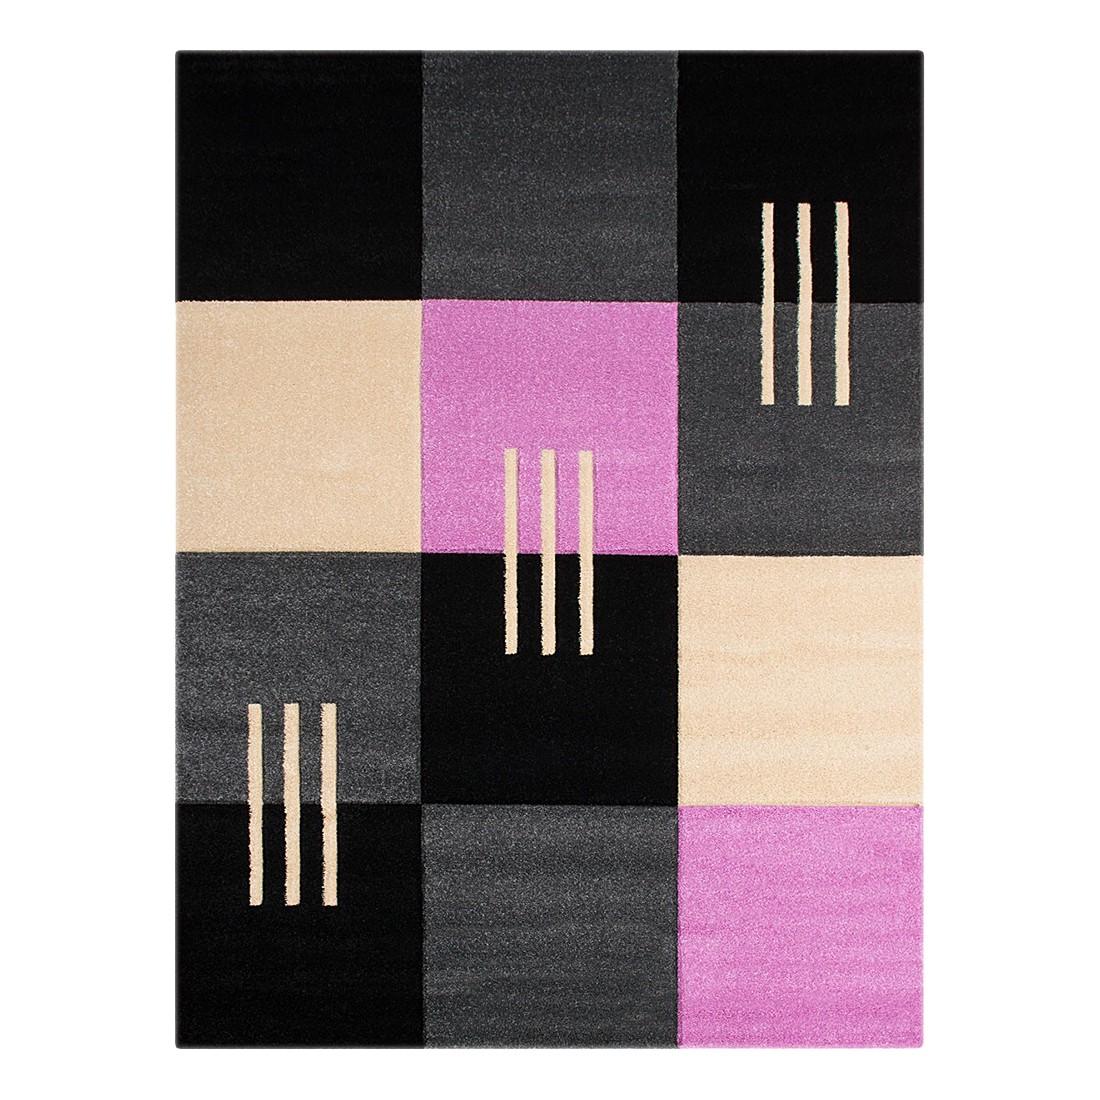 Teppich Nea Karomuster – Grau – 60 x 110 cm, Testil günstig